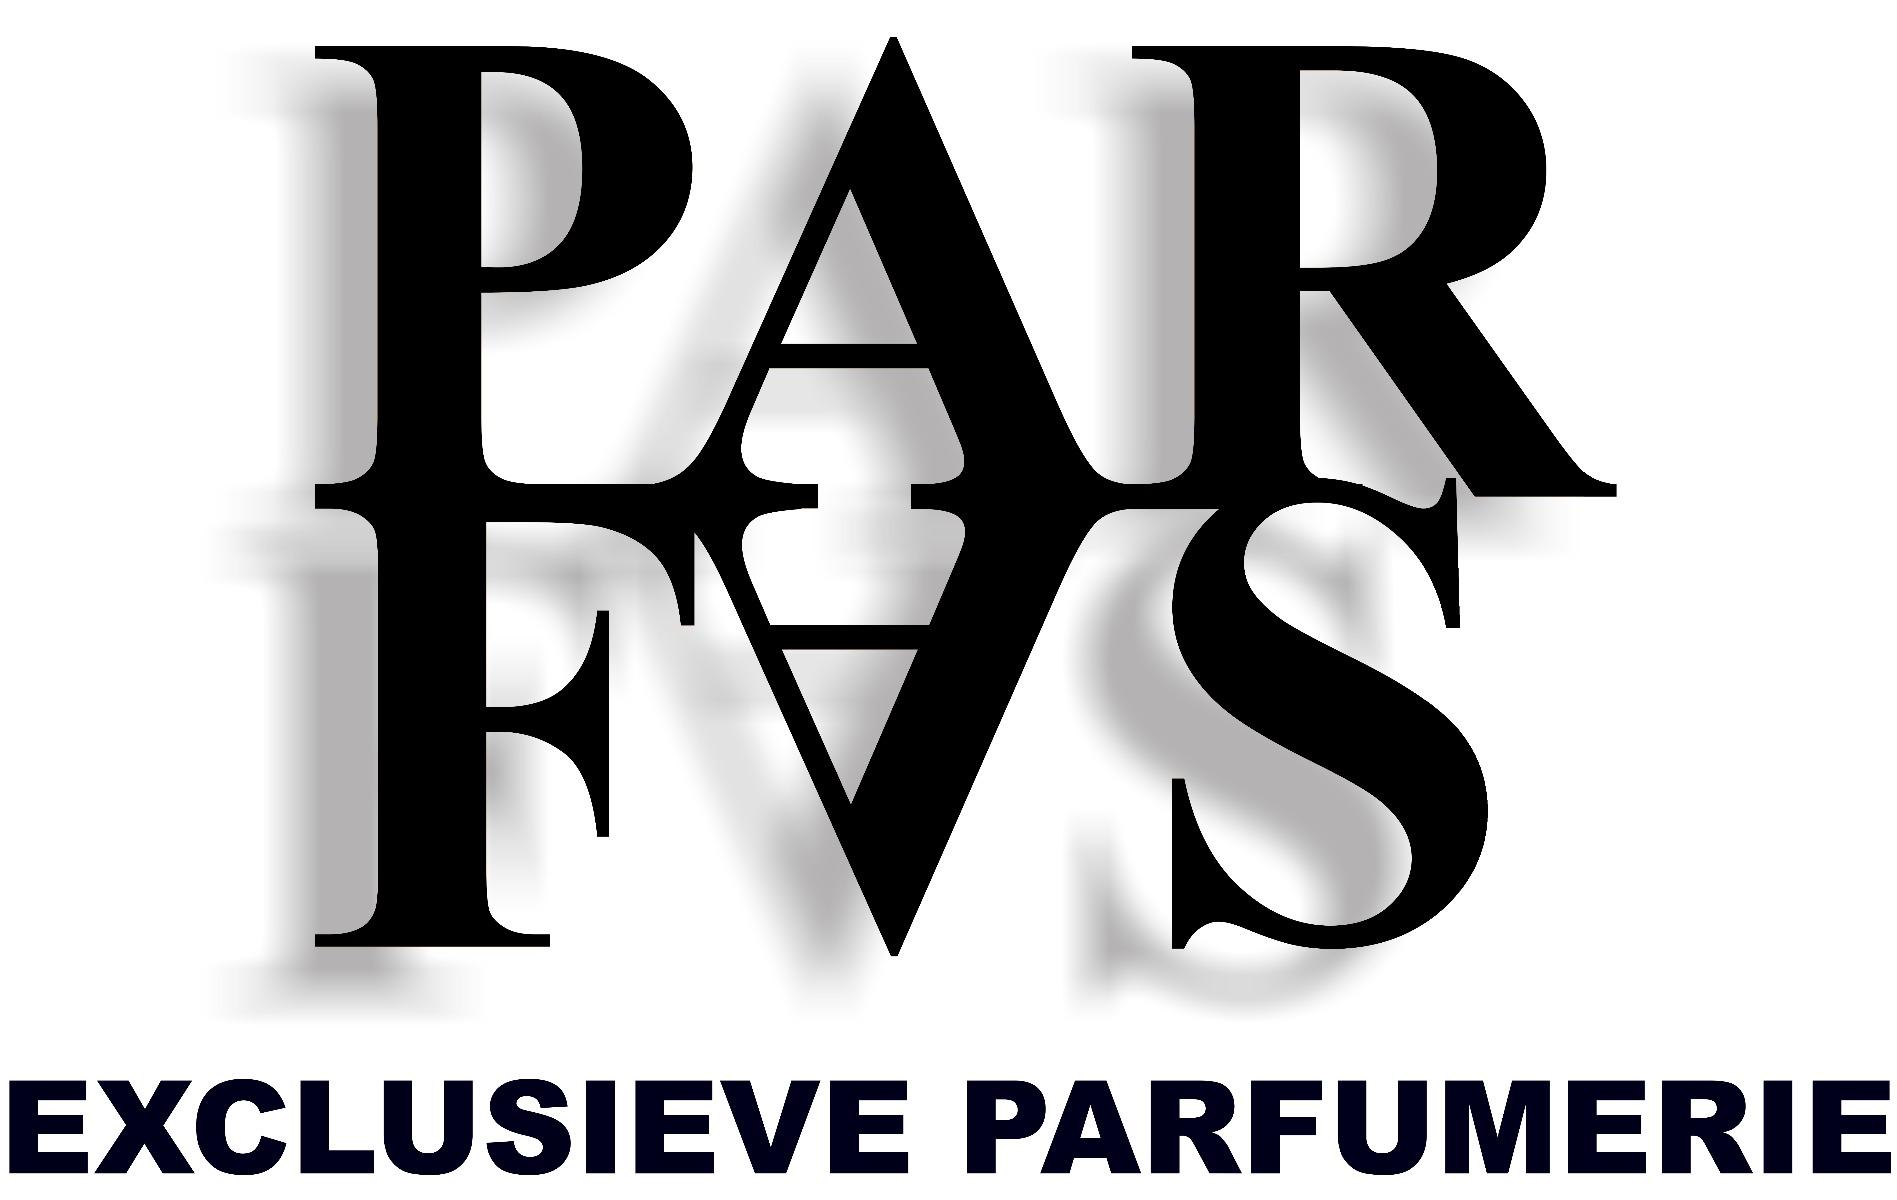 Parfas logo